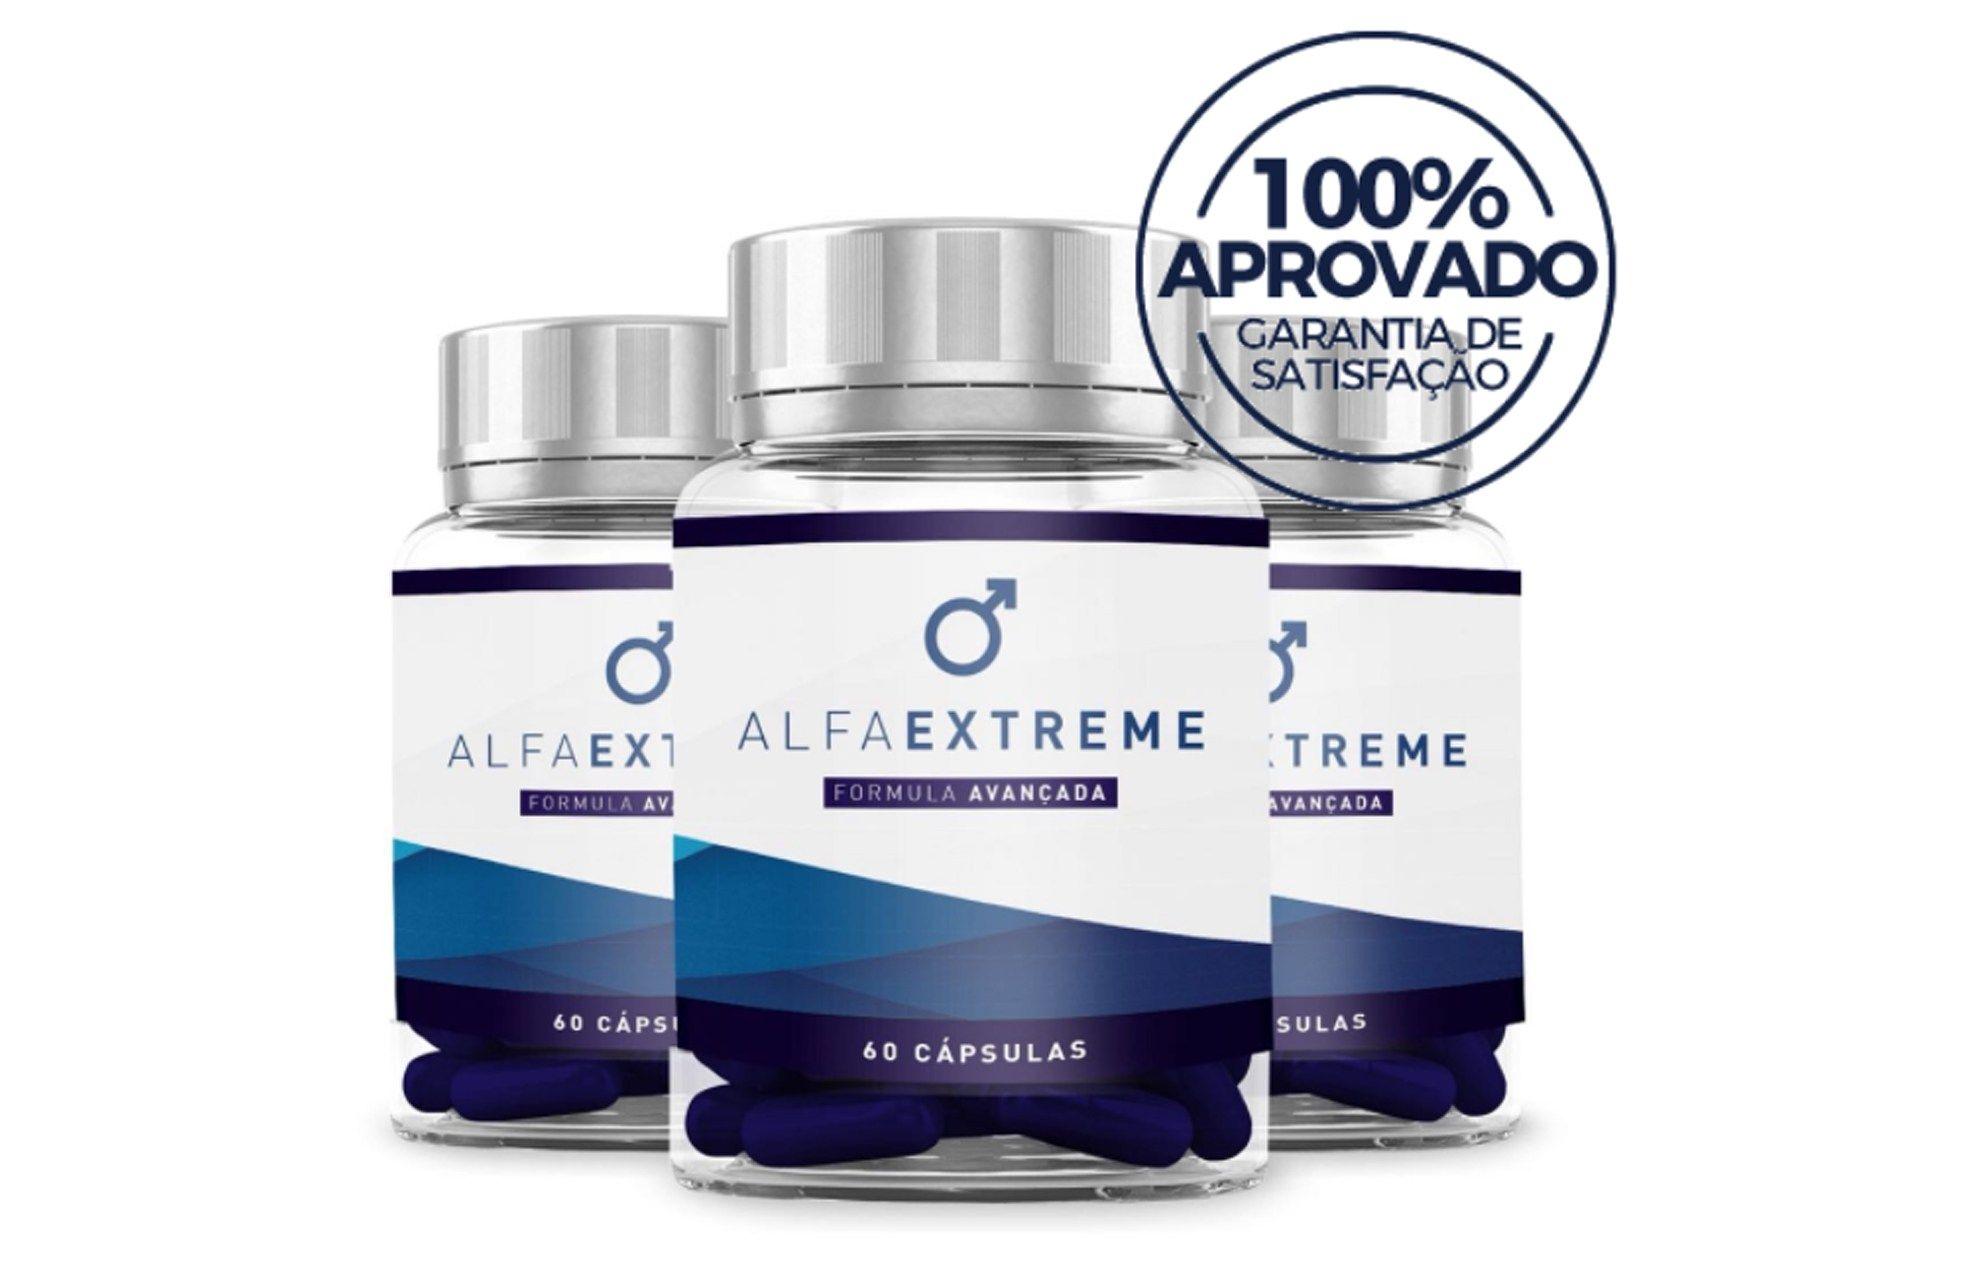 Alfa Extreme